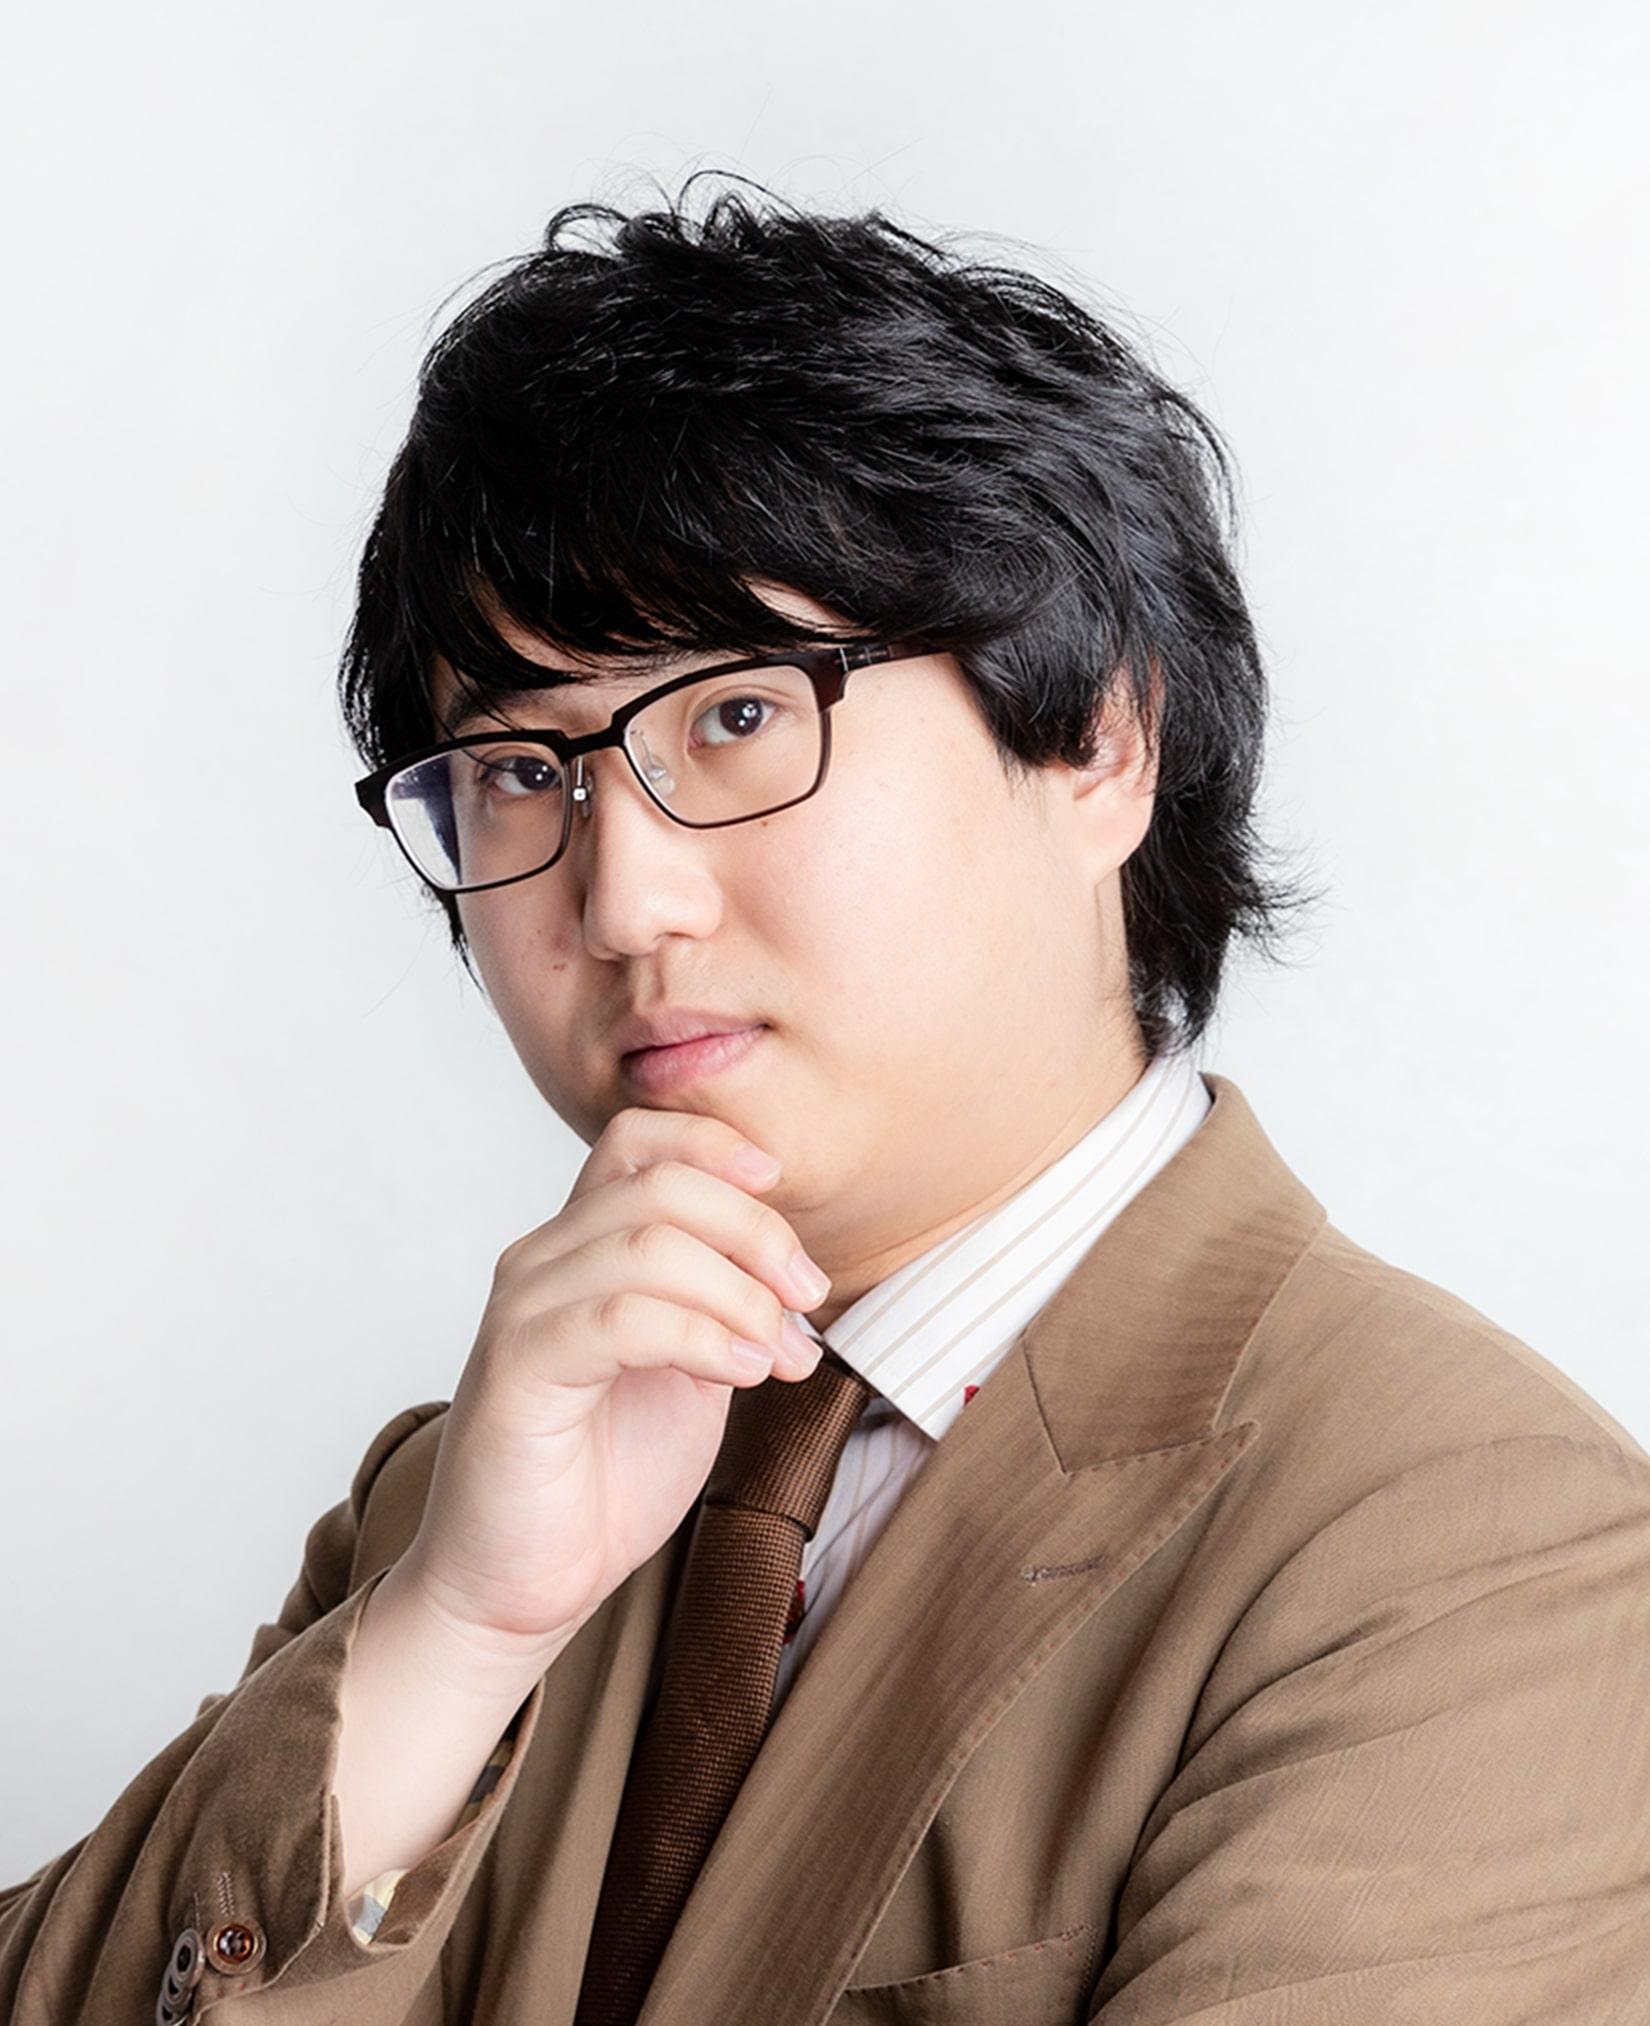 「株式会社ライバー」取締役会長 飯田祐基